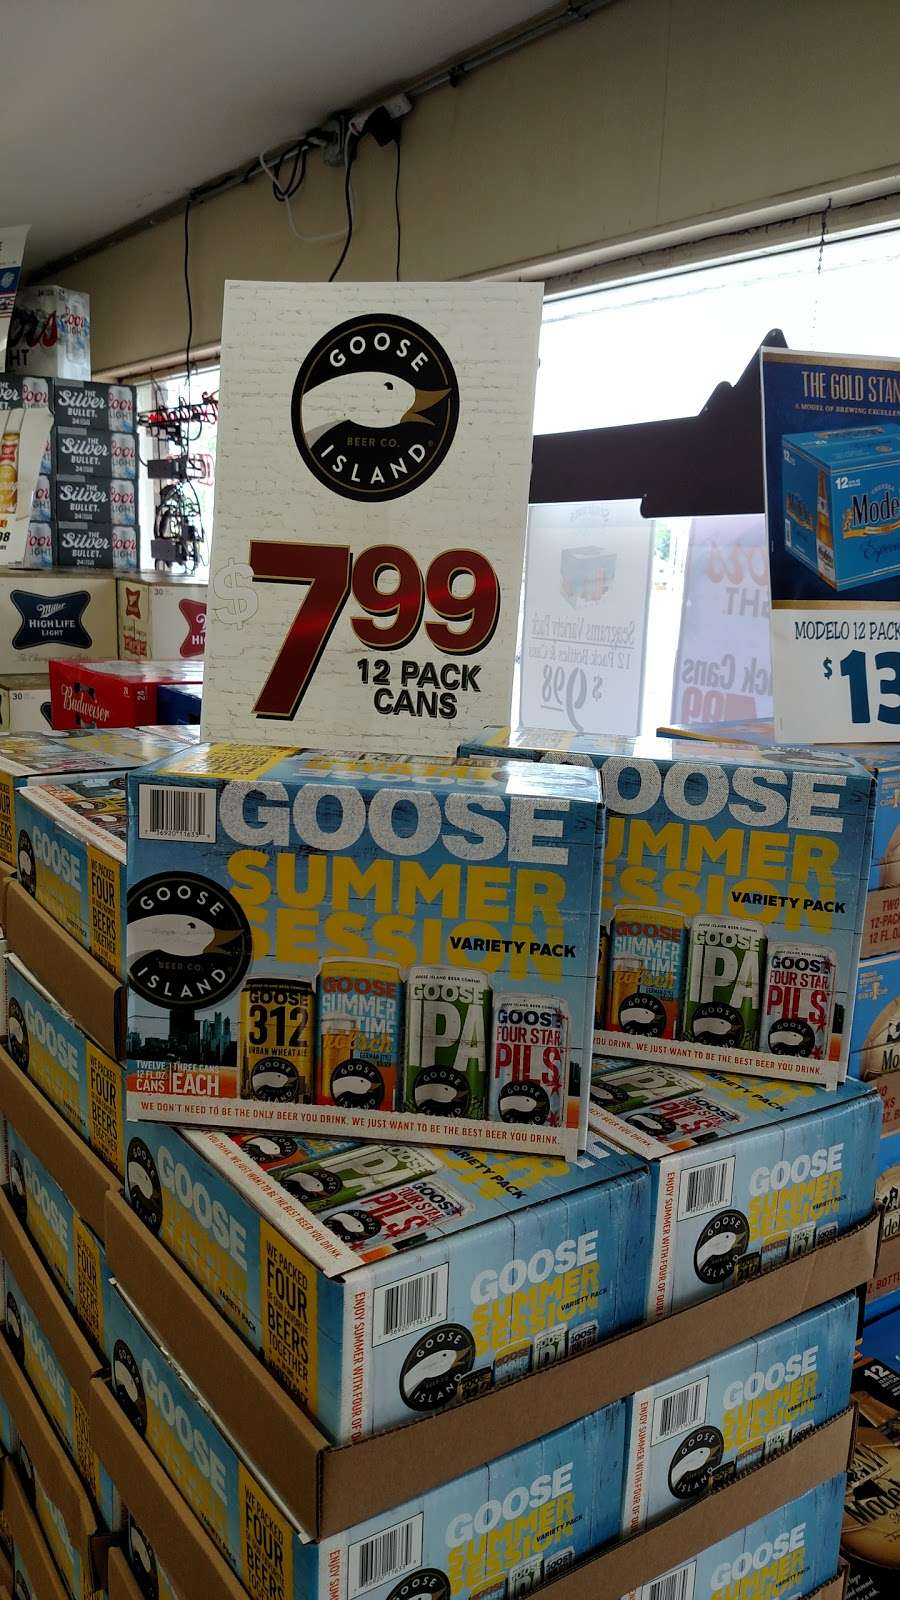 Consumers Liquor Stores Inc - store  | Photo 5 of 10 | Address: 1134 Plainfield Rd, Joliet, IL 60435, USA | Phone: (815) 723-7331